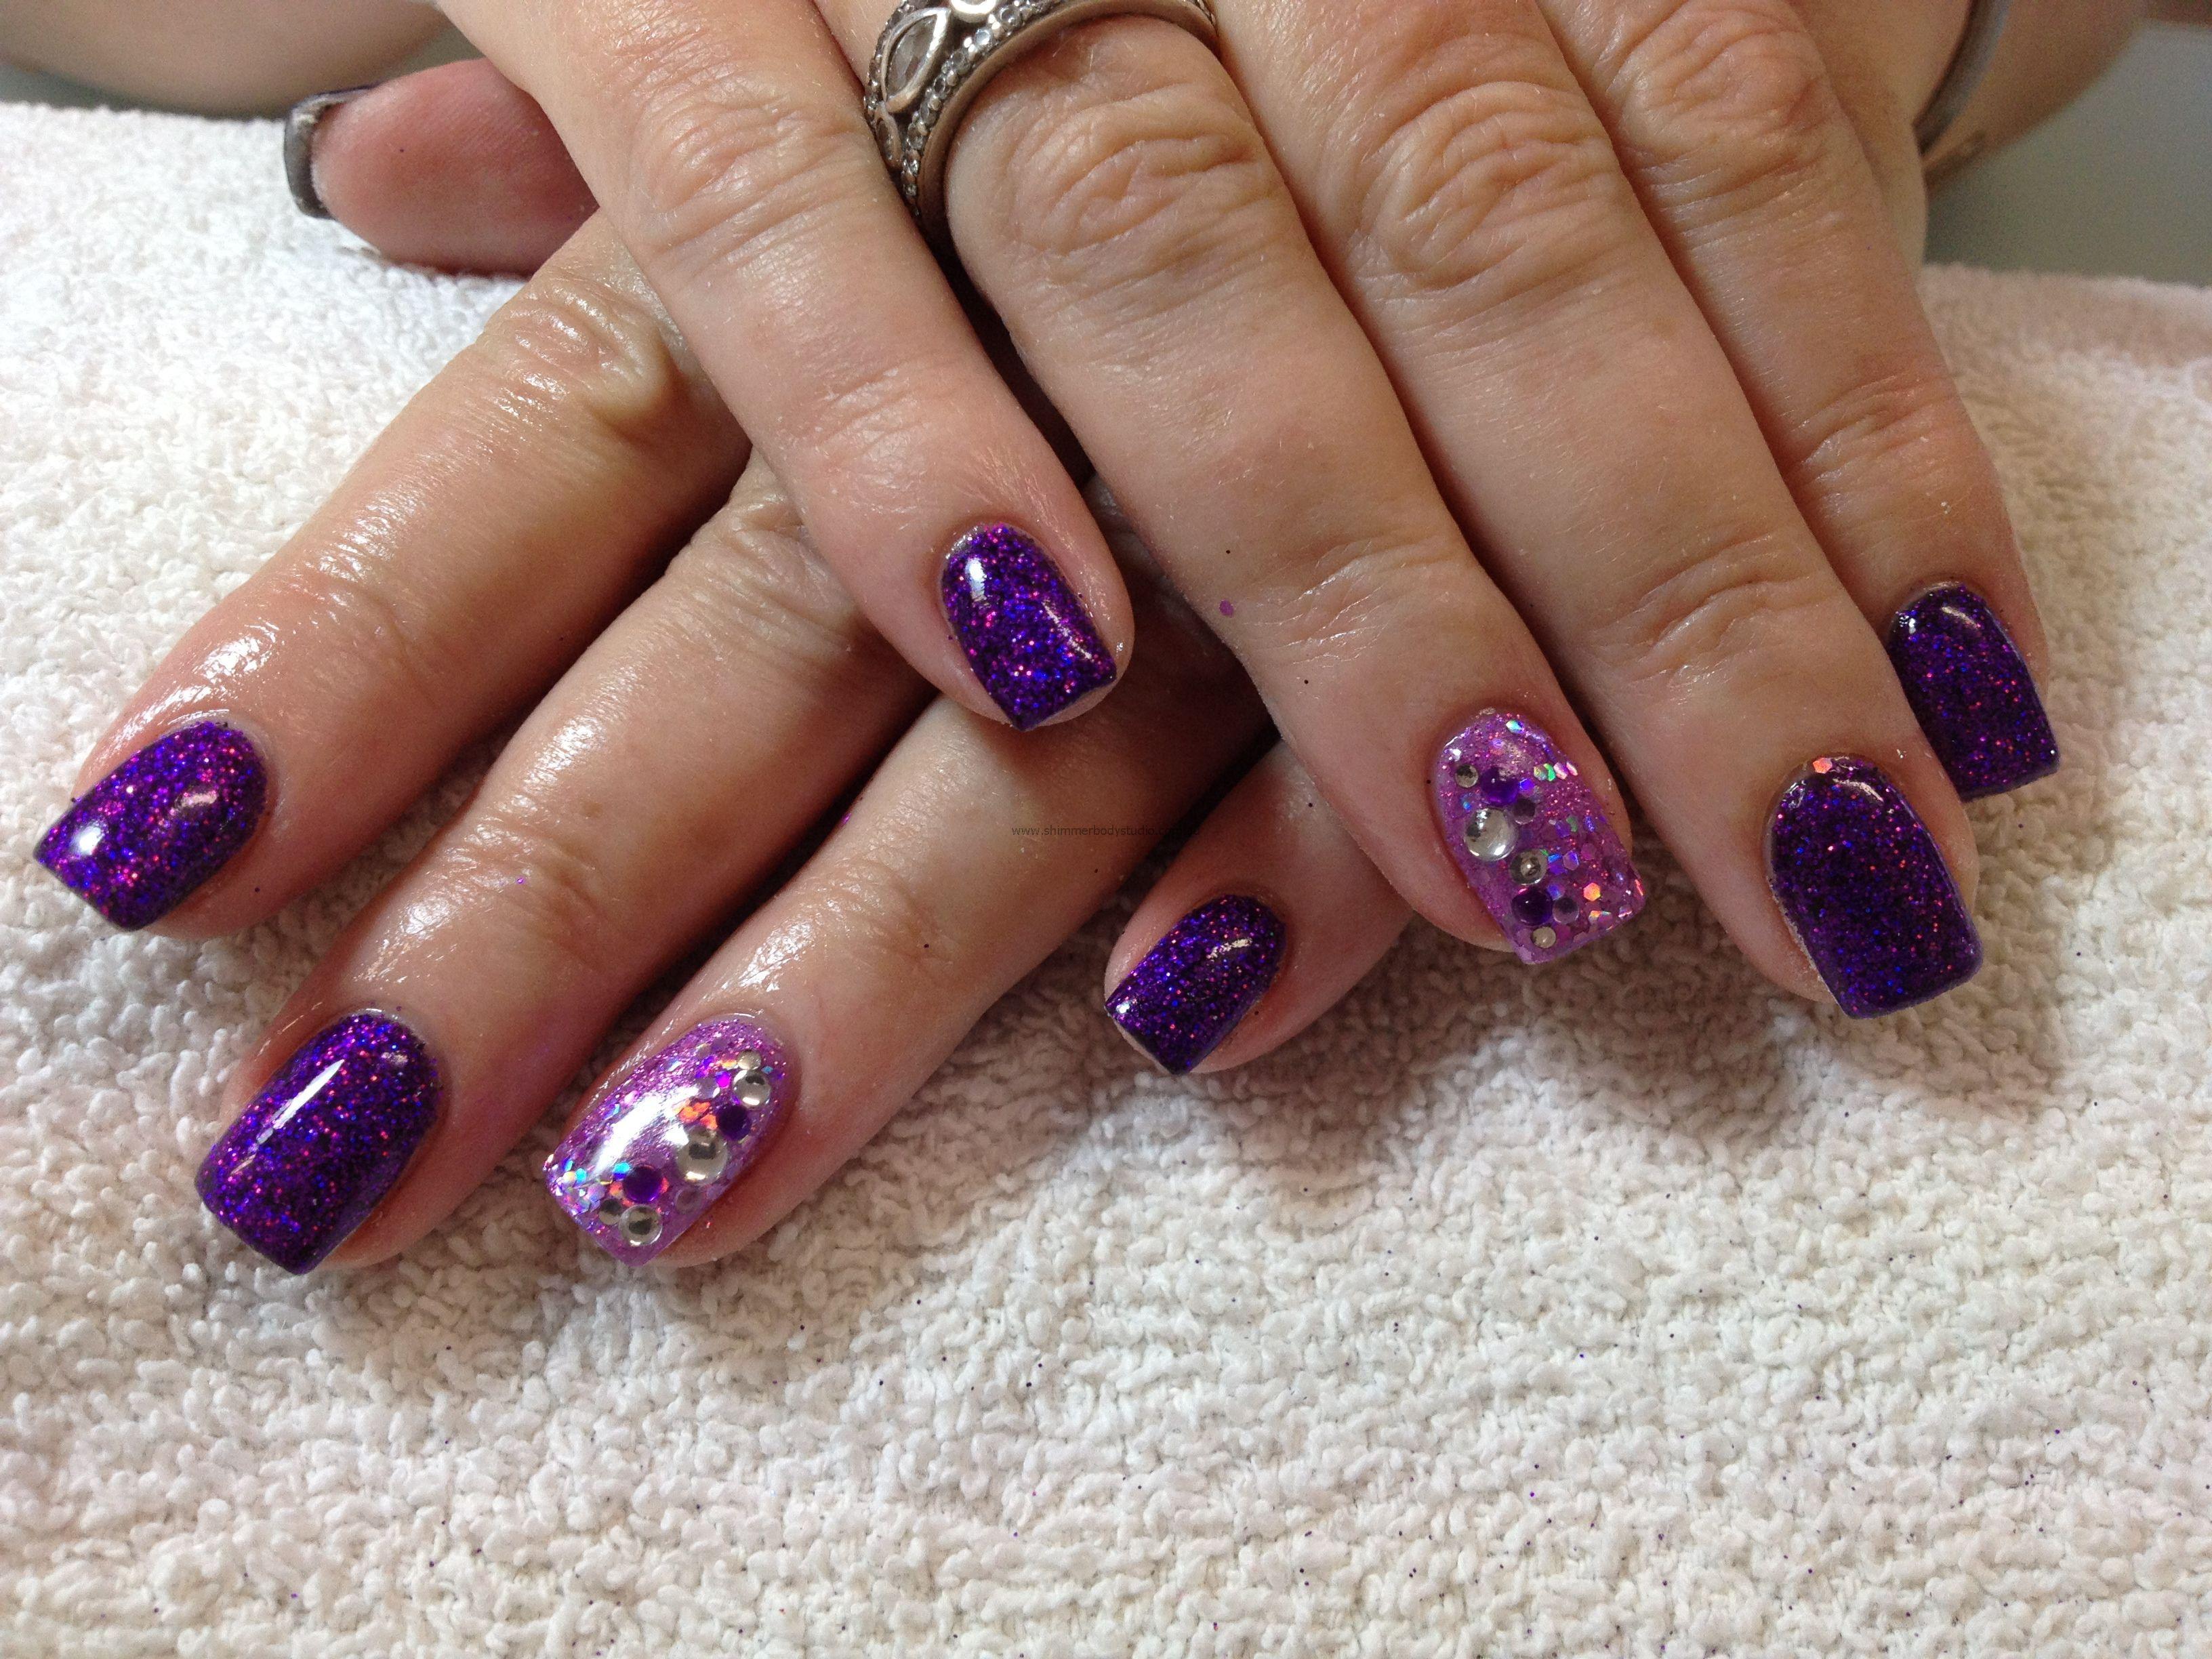 Gel nails, glitter nails, purple glitter, crystals diamante nail art ...